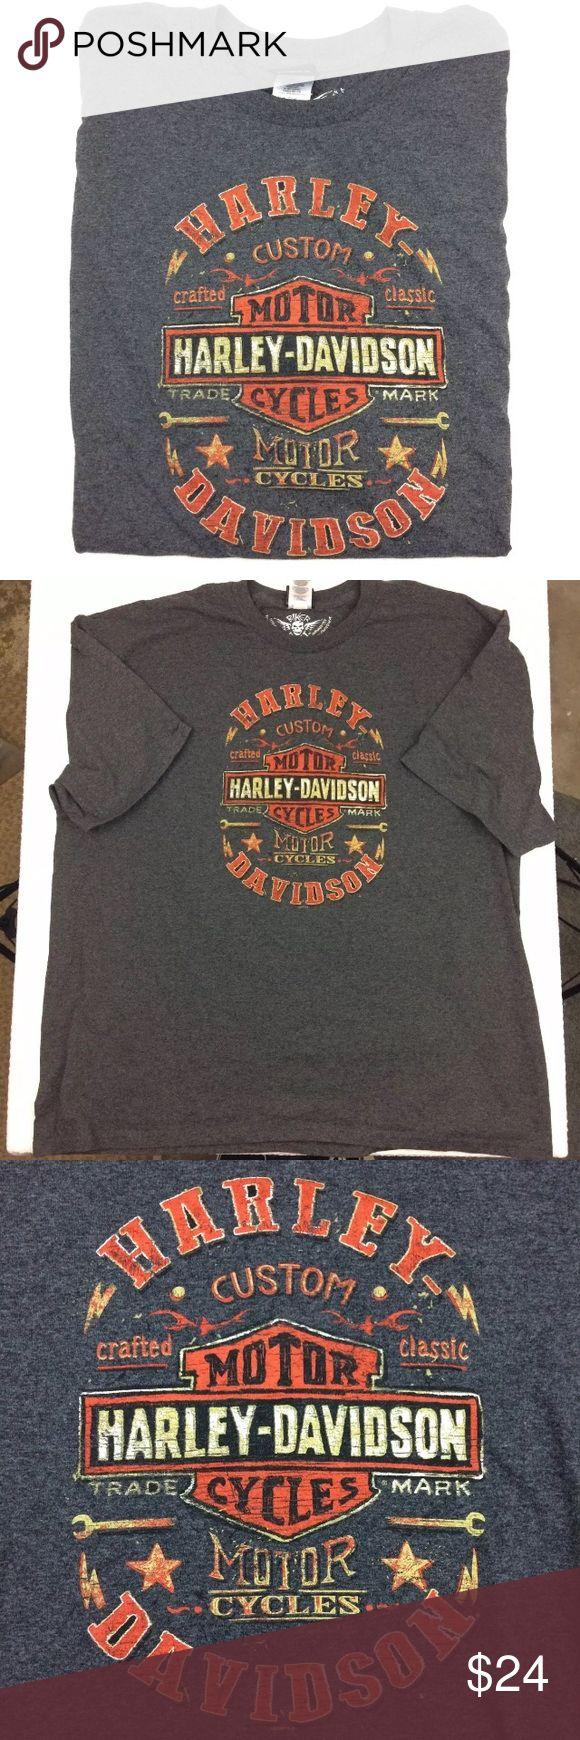 Harley Davidson Bedford Texas Tshirt This is a stoney dark grey Harley Davidson Bedford Texas tshirt. It is really great shape. Mens sz 3X Harley-Davidson Shirts Tees - Short Sleeve